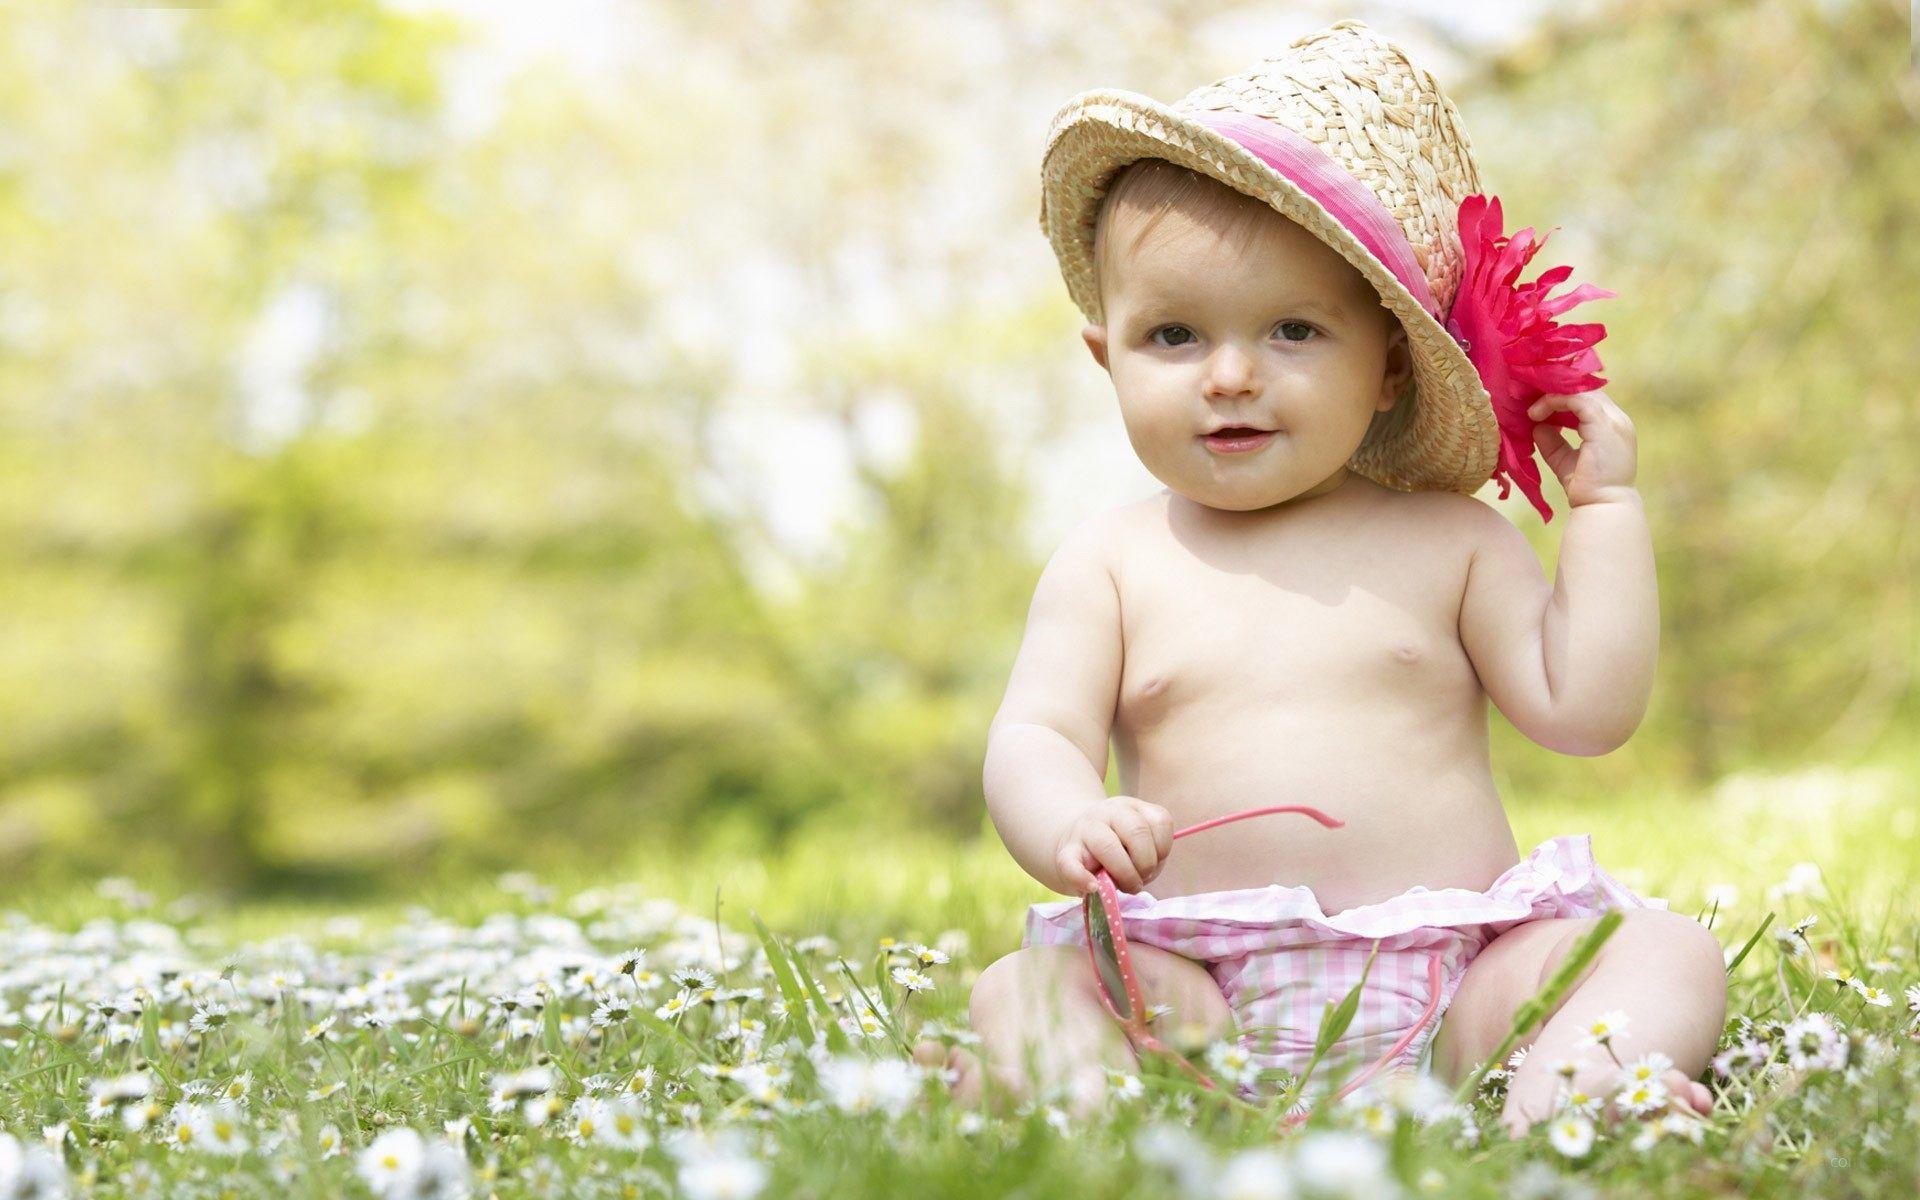 Wallpaper download cute - Cute Girl Babies Wallpapers Free Download